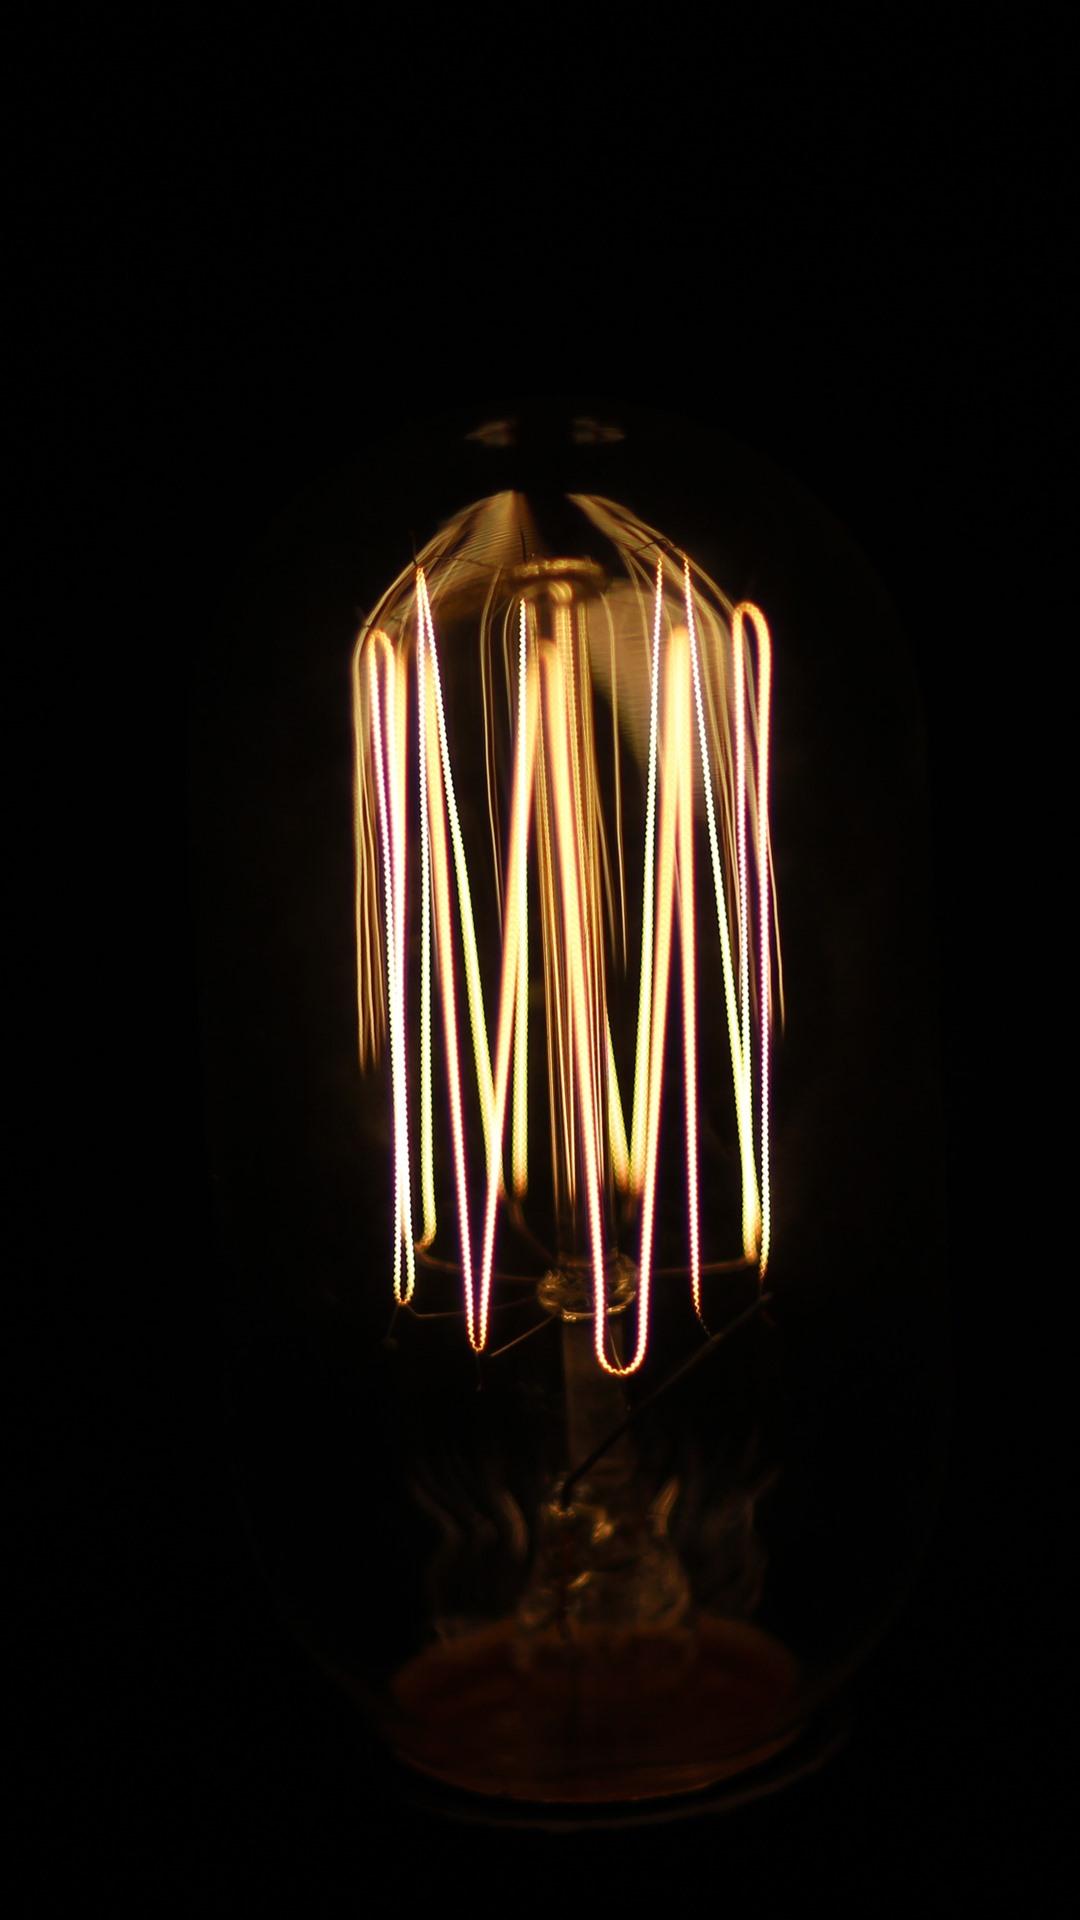 Lamp, light bulb, darkness 1242x2688 ...